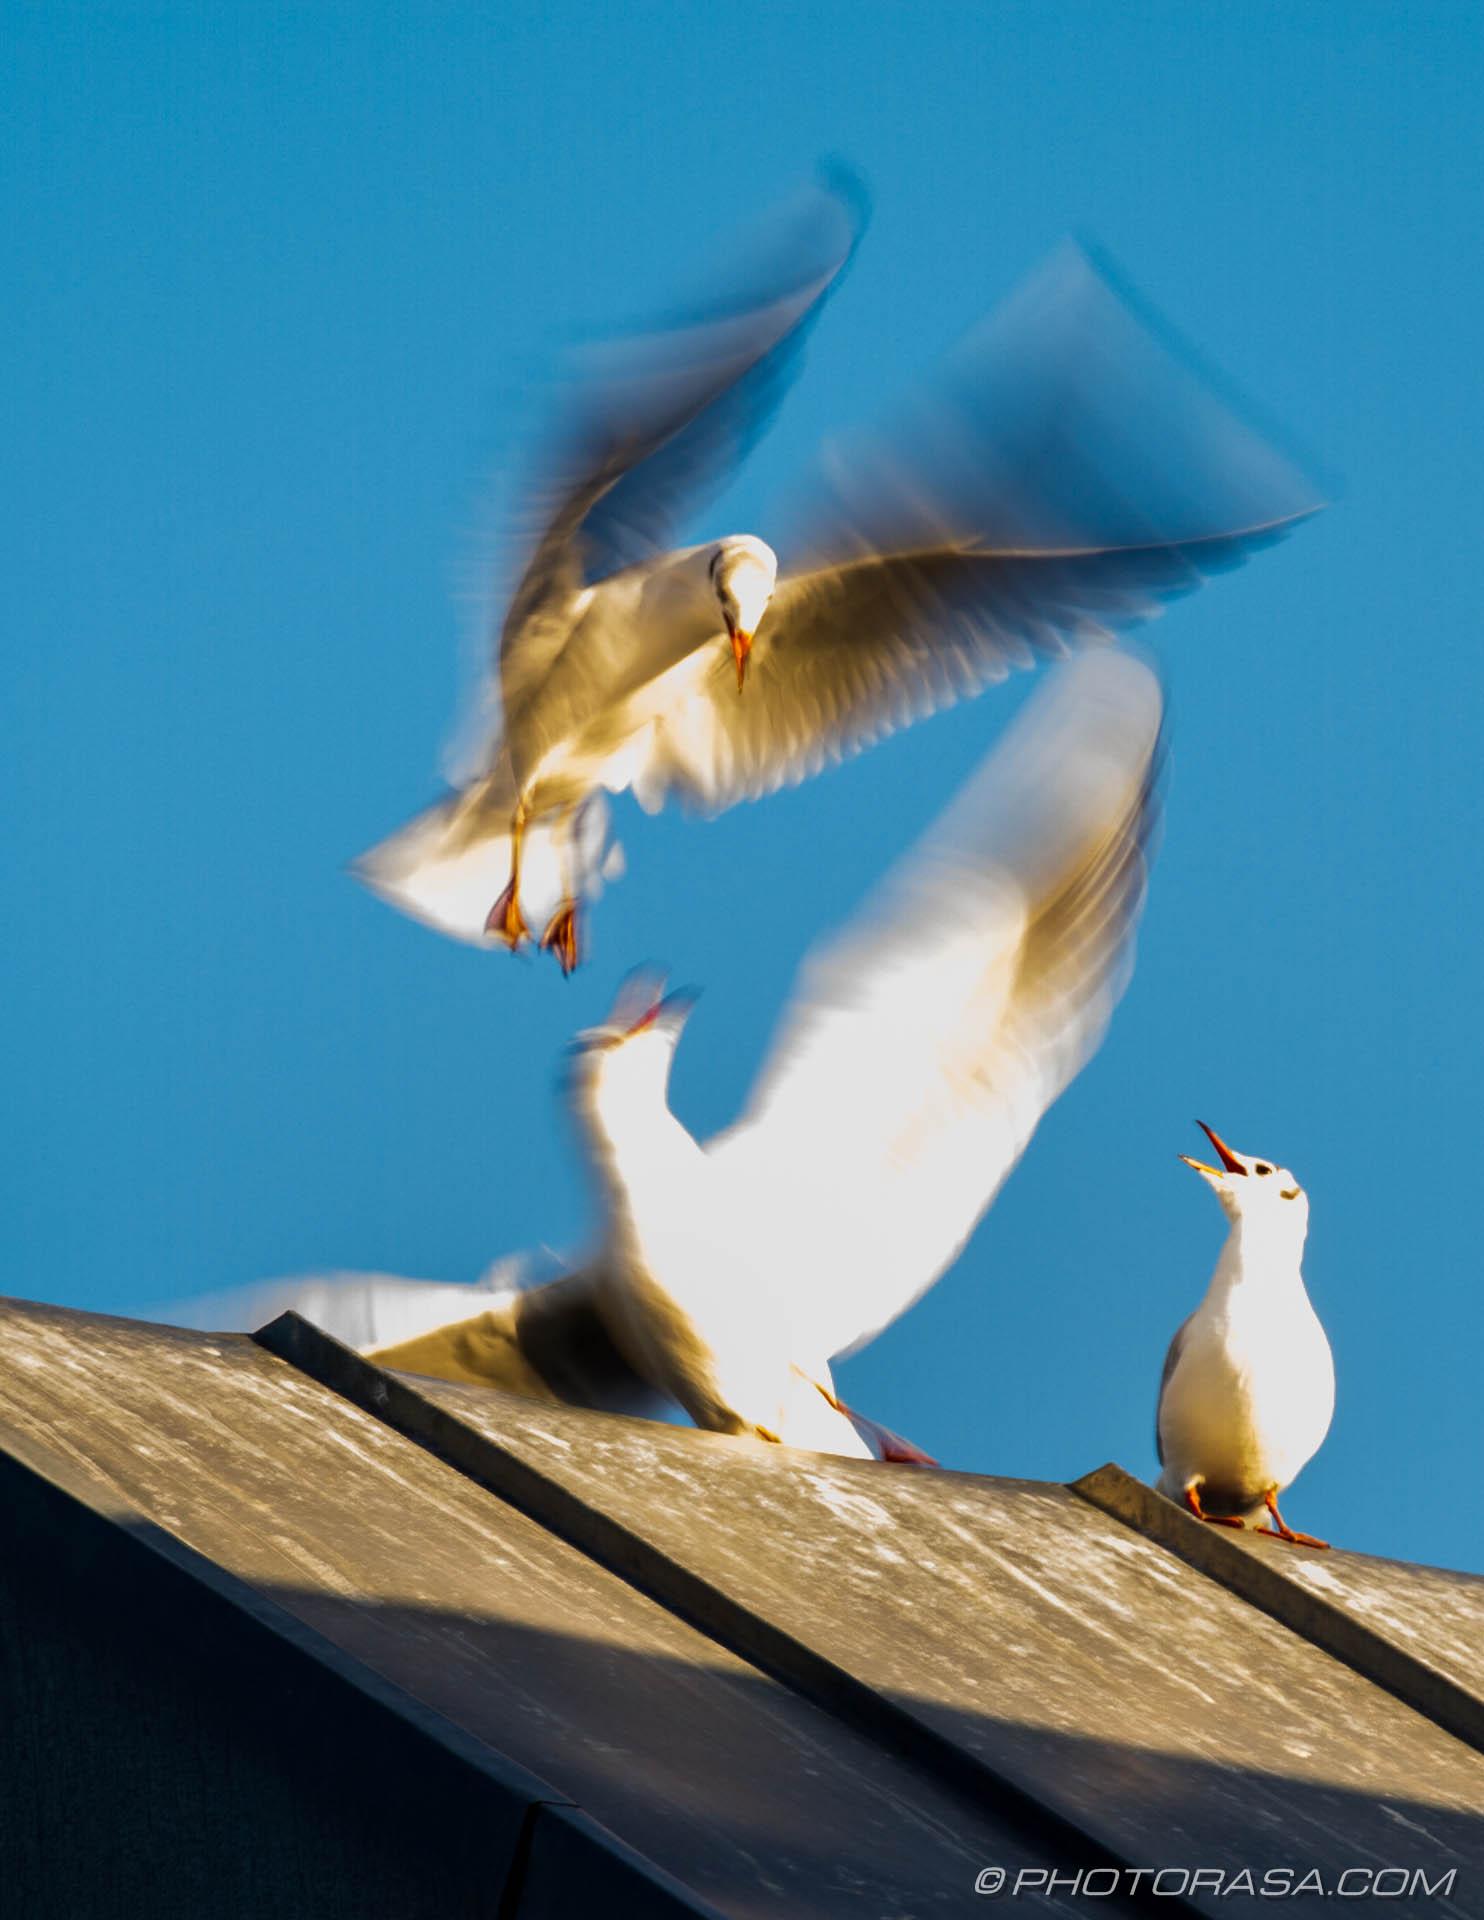 https://photorasa.com/seagulls/seagulls-fighting-on-rooftop/